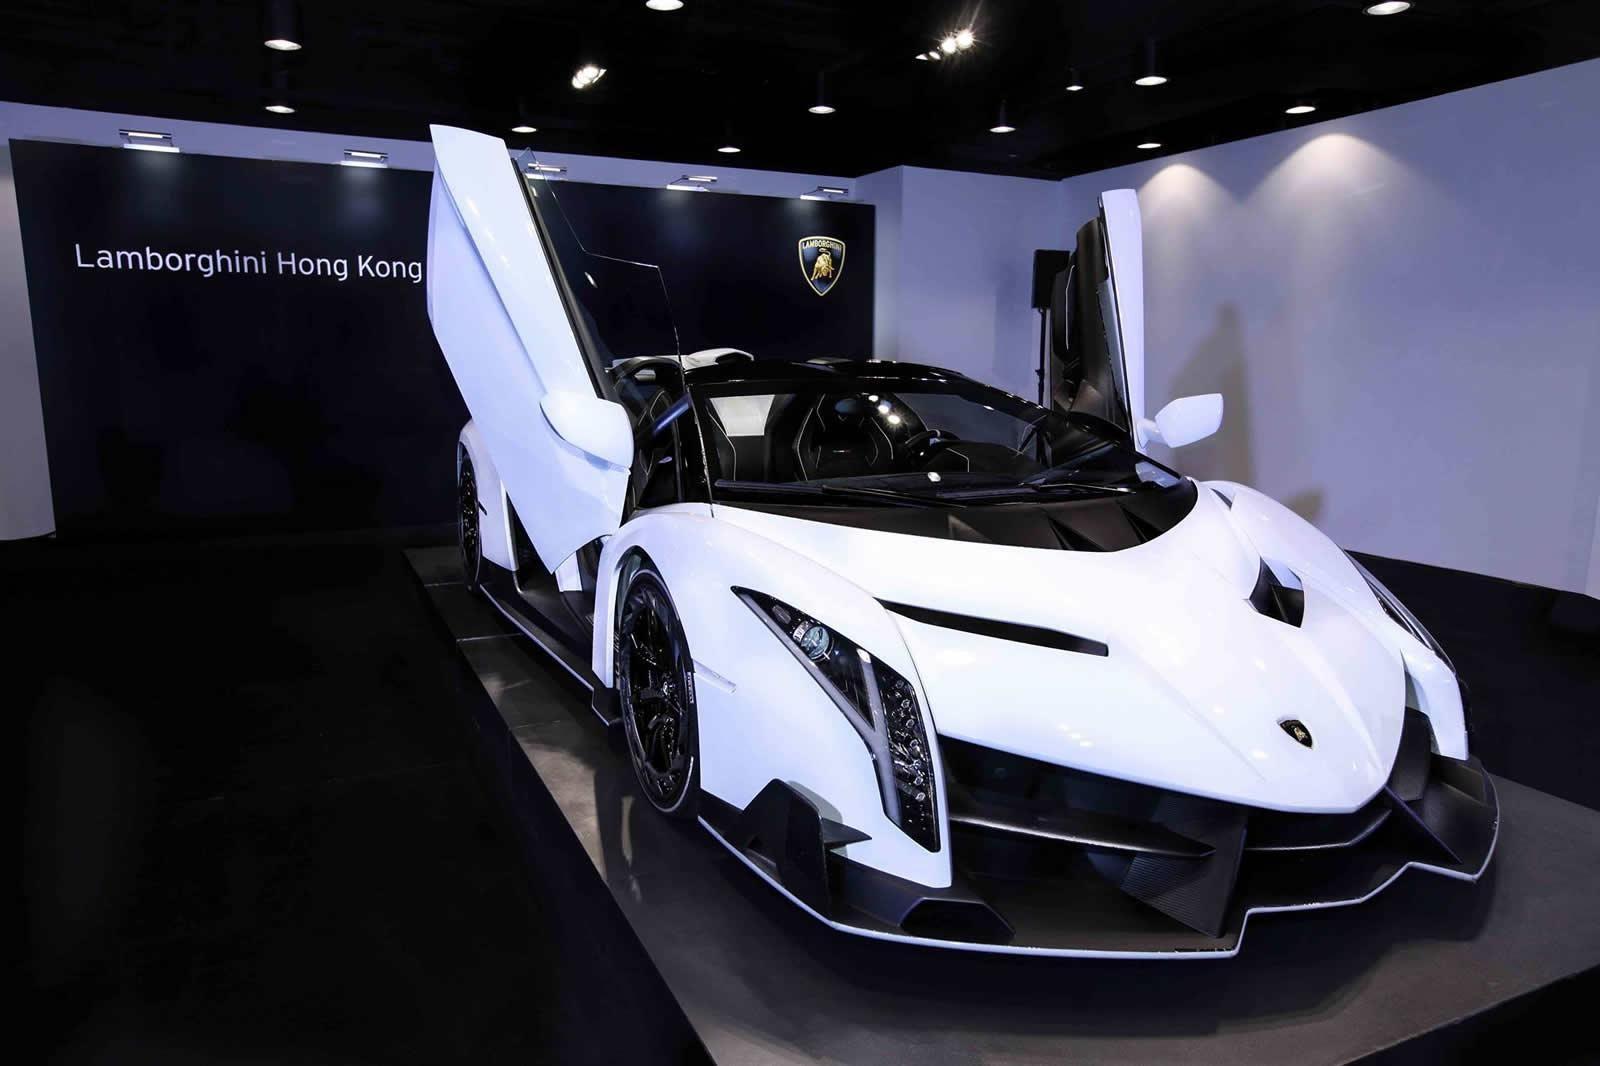 white lamborghini veneno roadster wallpaper hd car wallpapers - White Lamborghini Veneno Wallpaper